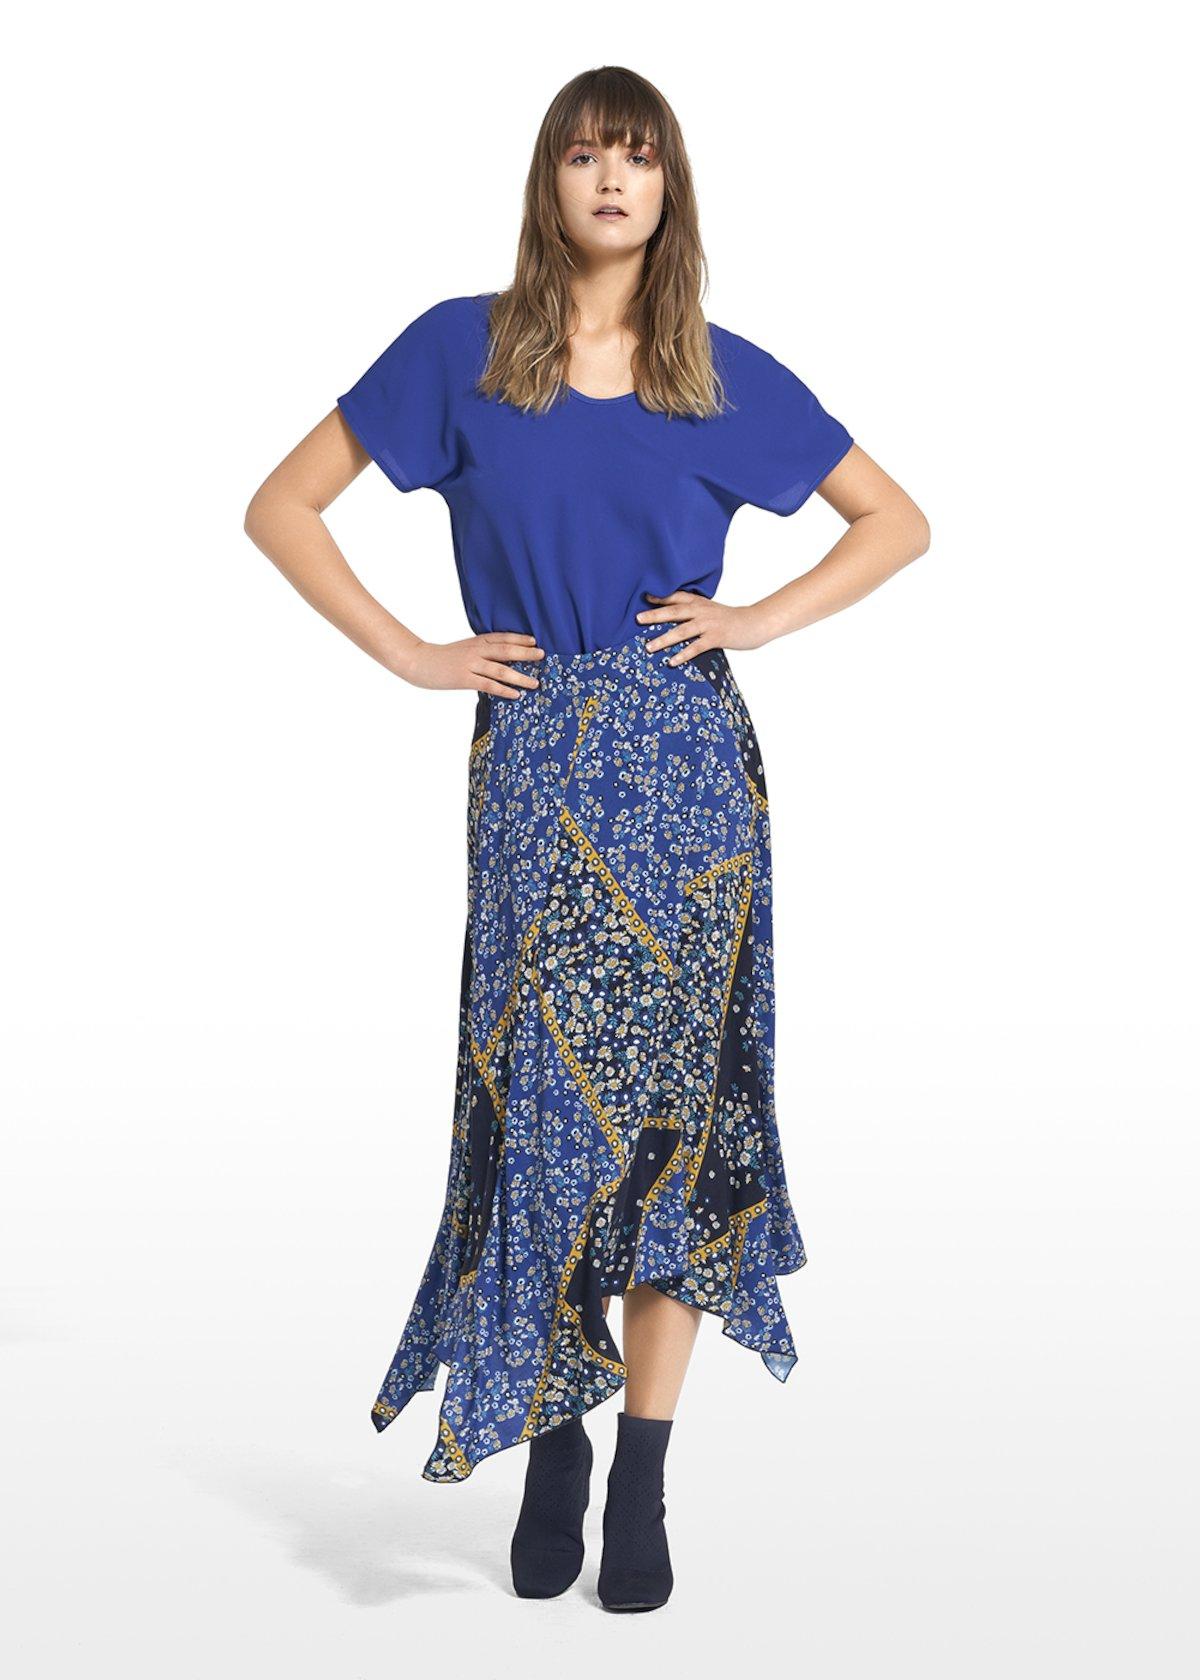 Skirt Glory with asymmetric cut - Avion / Miele Fantasia - Woman - Category image